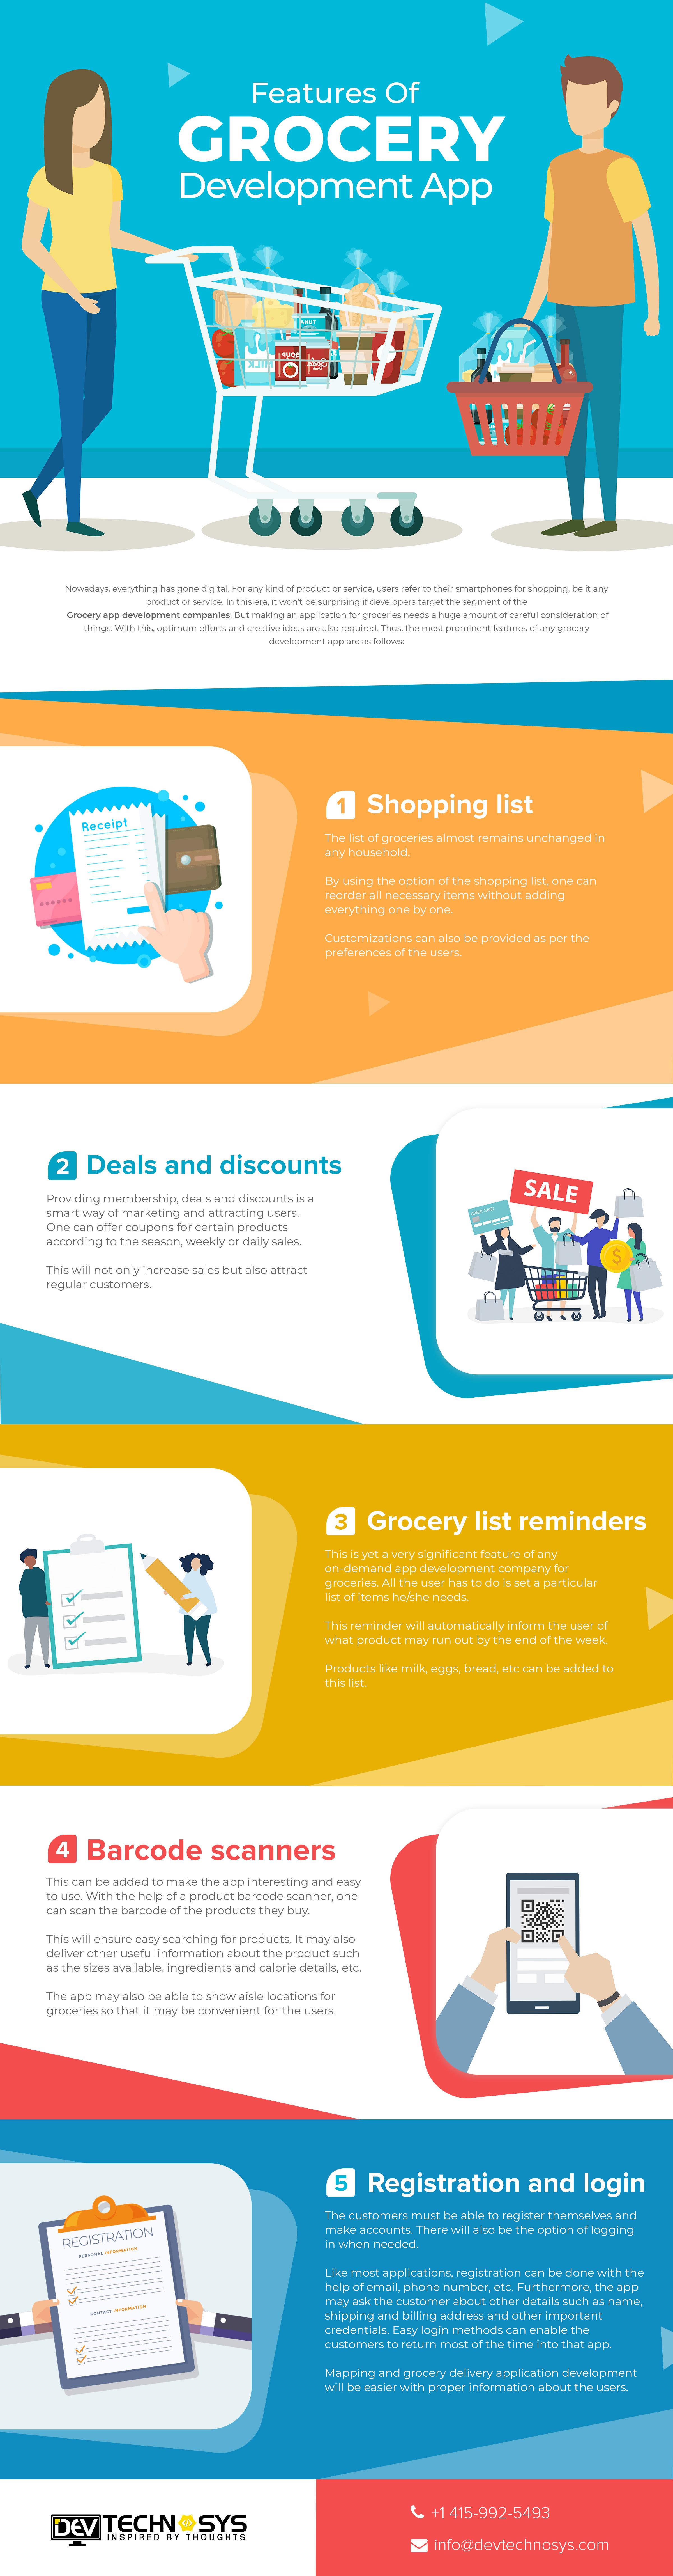 Features of Grocery development app